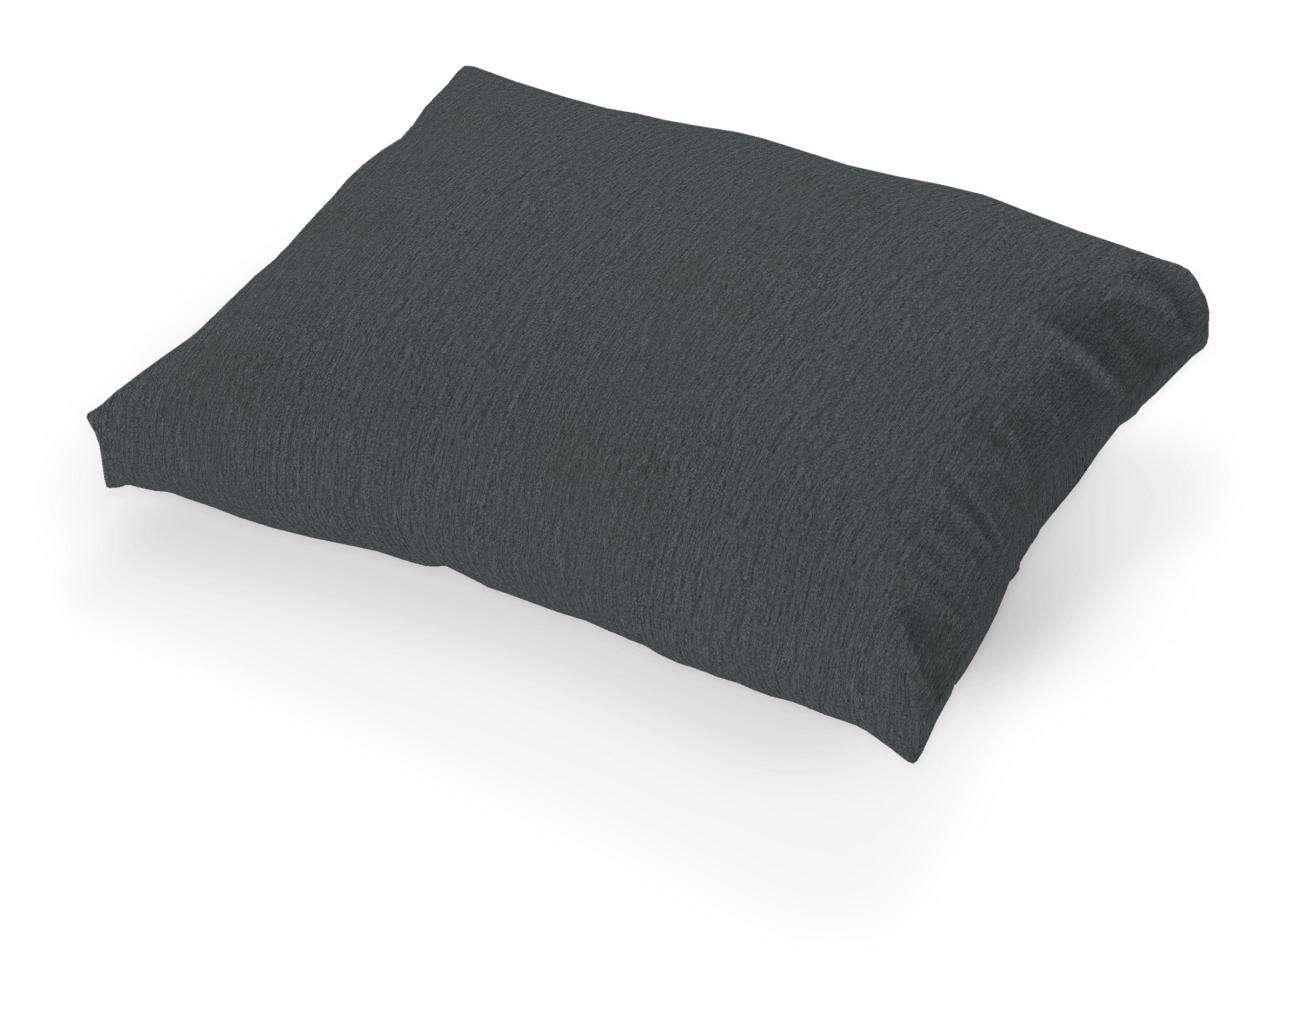 Tylösand pagalvėlės užvalkalas Tylösand pagalvėlė kolekcijoje Chenille, audinys: 702-20